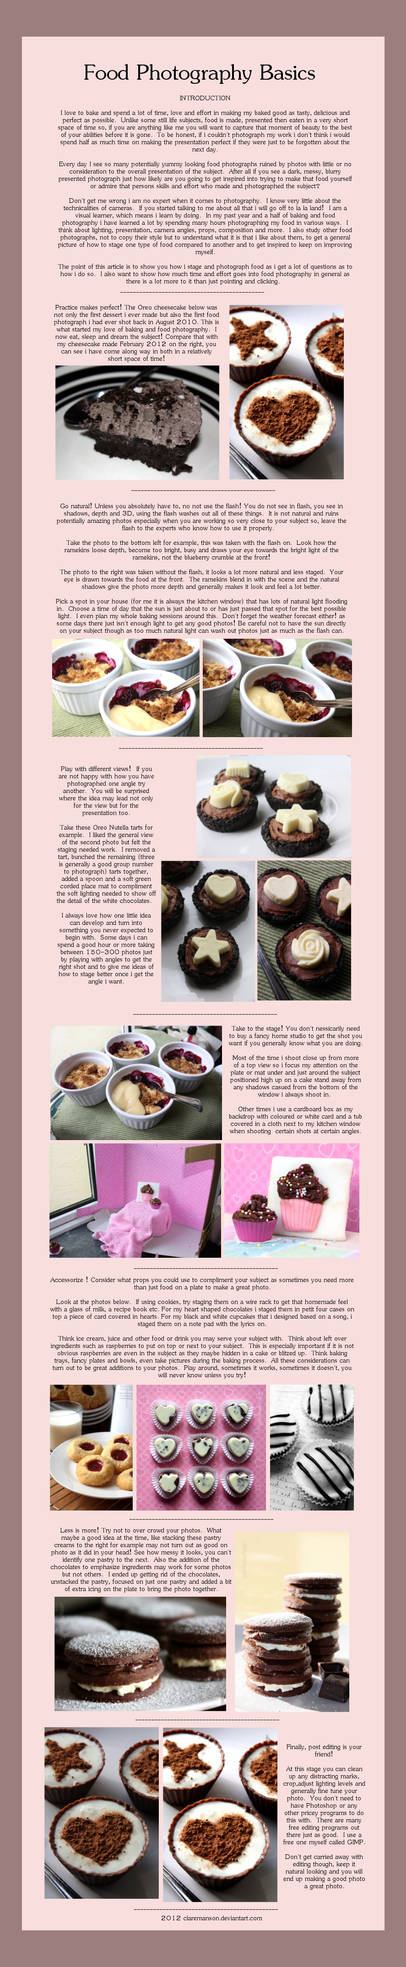 Food Photography Basics by claremanson